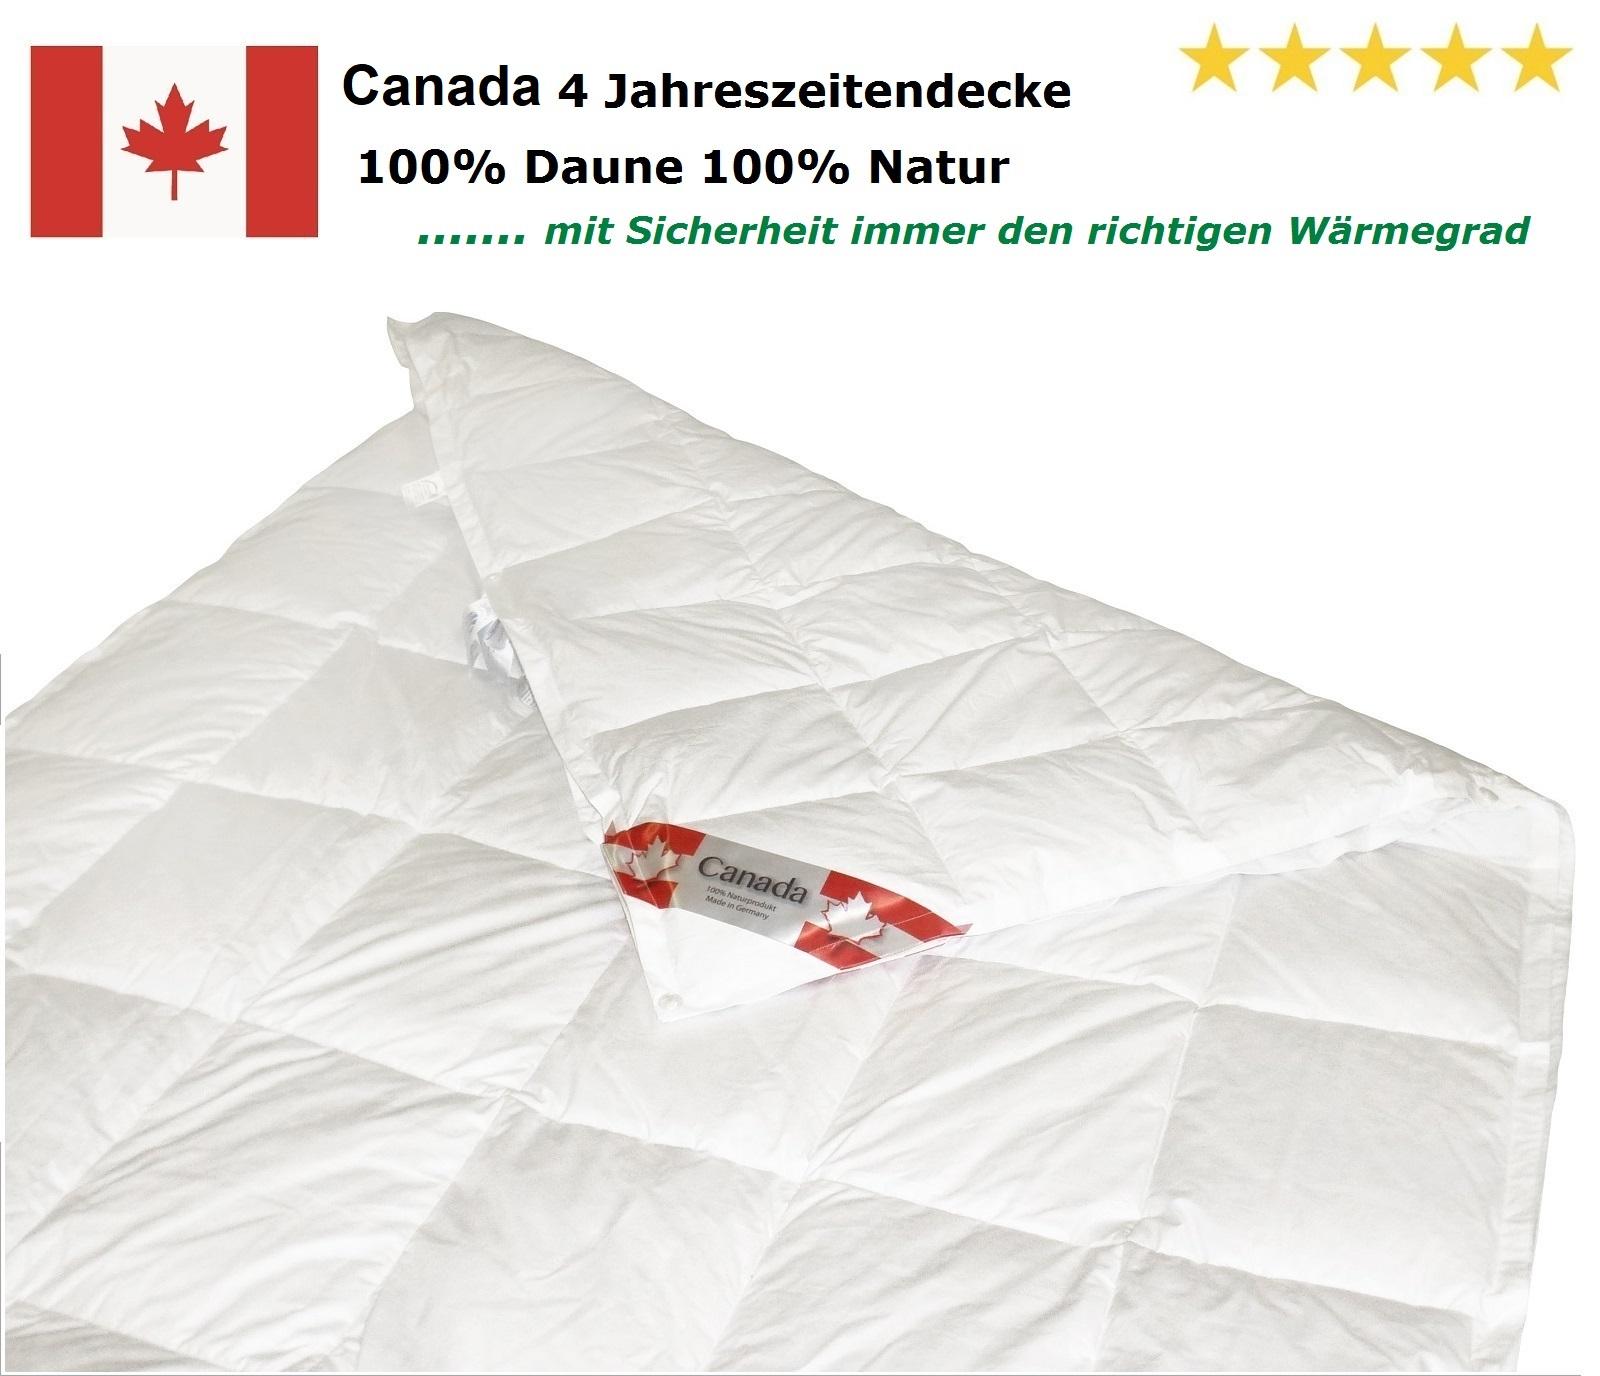 Canada Kassetten Daunendecke 4-Jahreszeiten 100% canadische Daunen 200x200